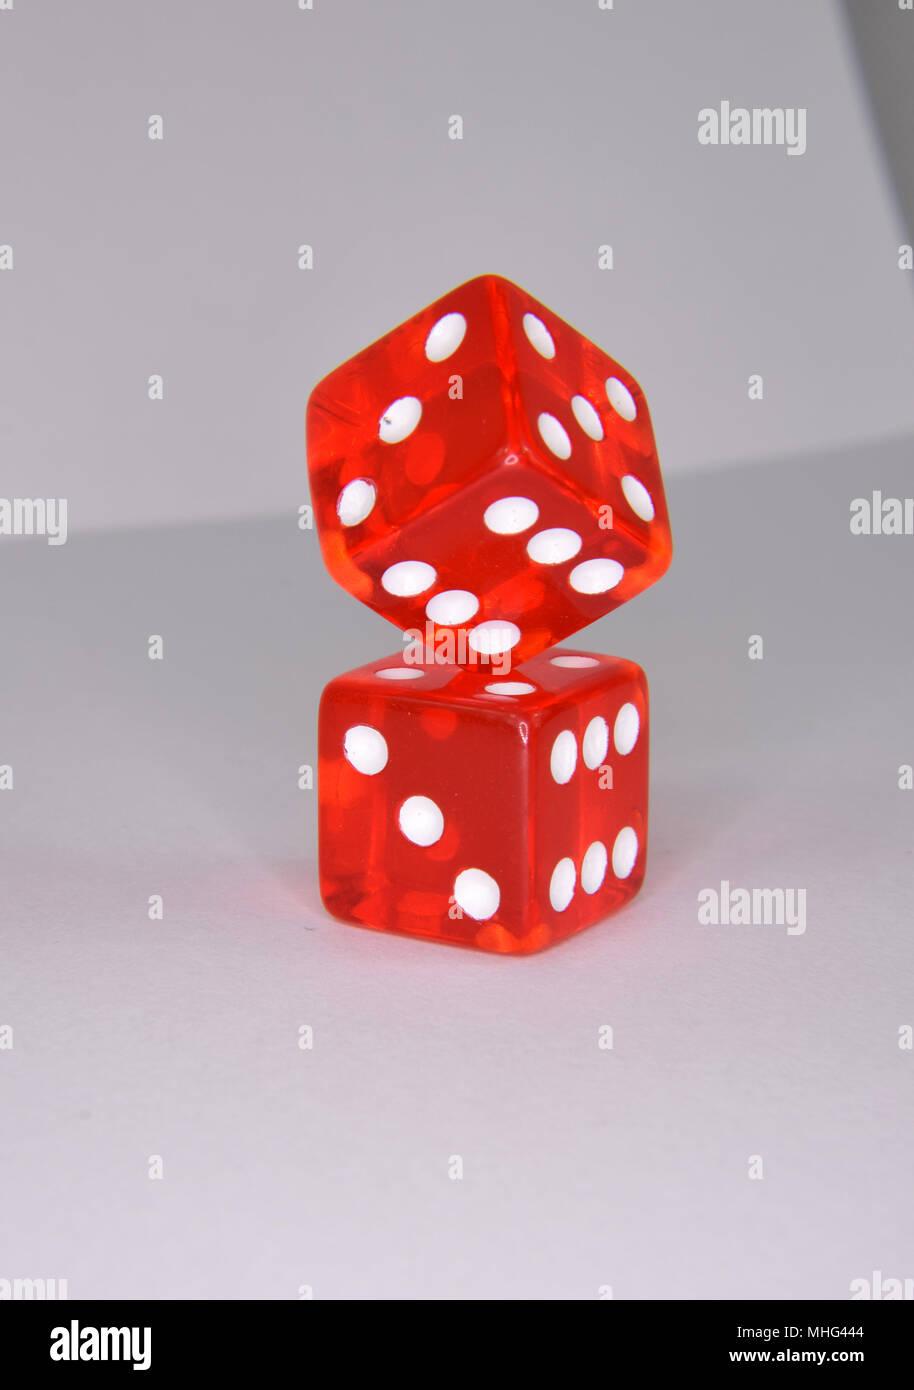 Stacked and balancing red luminescent casino gambling dice Stock Photo